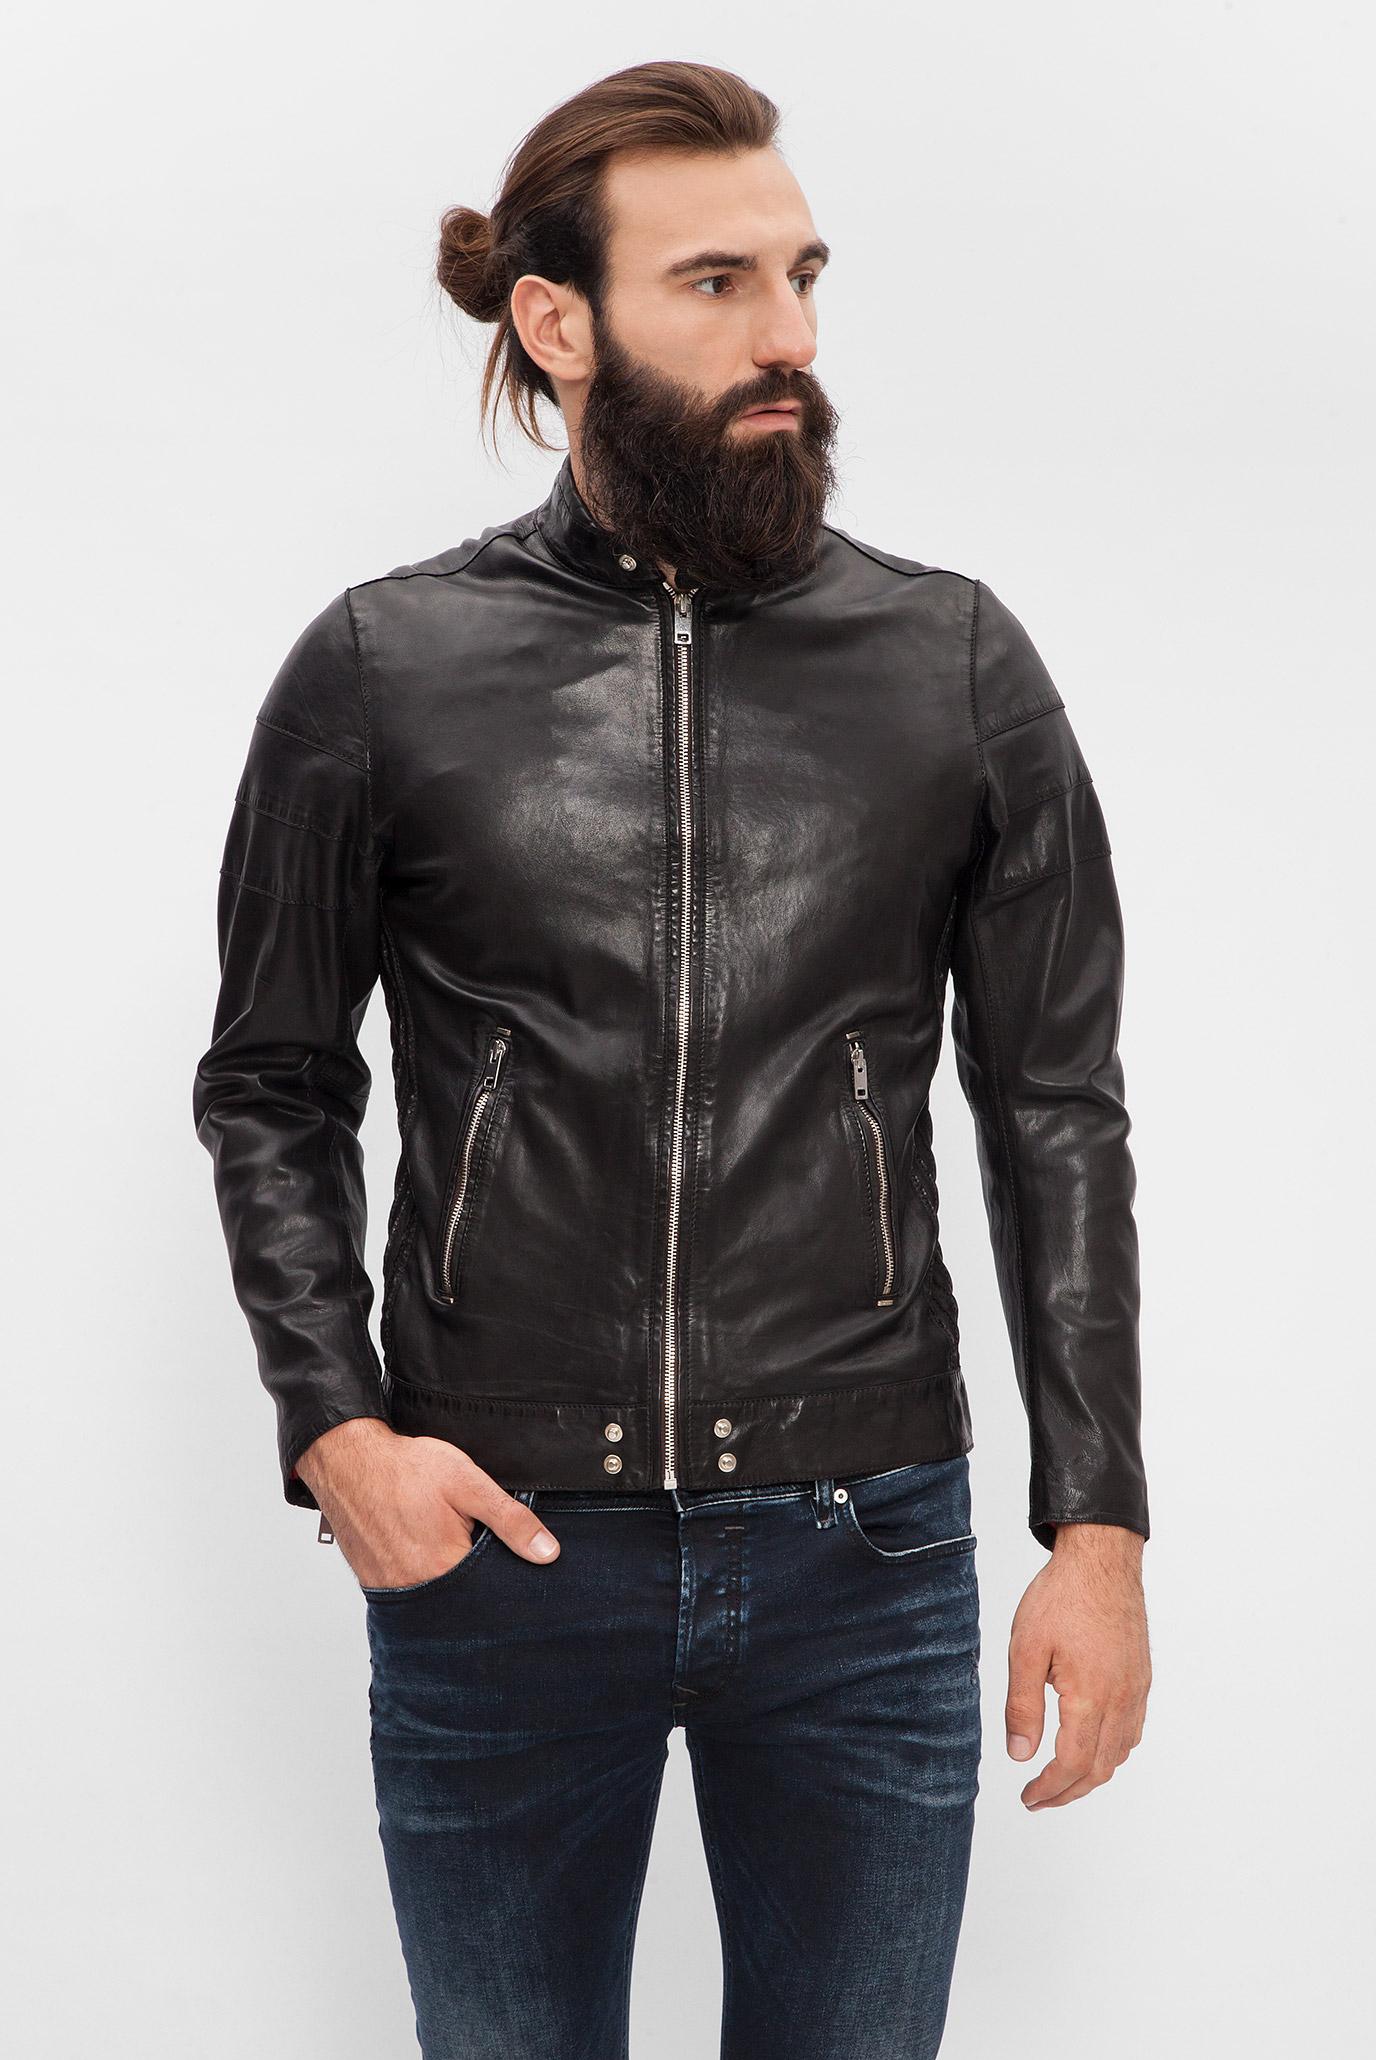 Купить Мужская черная кожаная куртка Diesel Diesel 00S11D 0DAMJ – Киев 9a97b096a5682